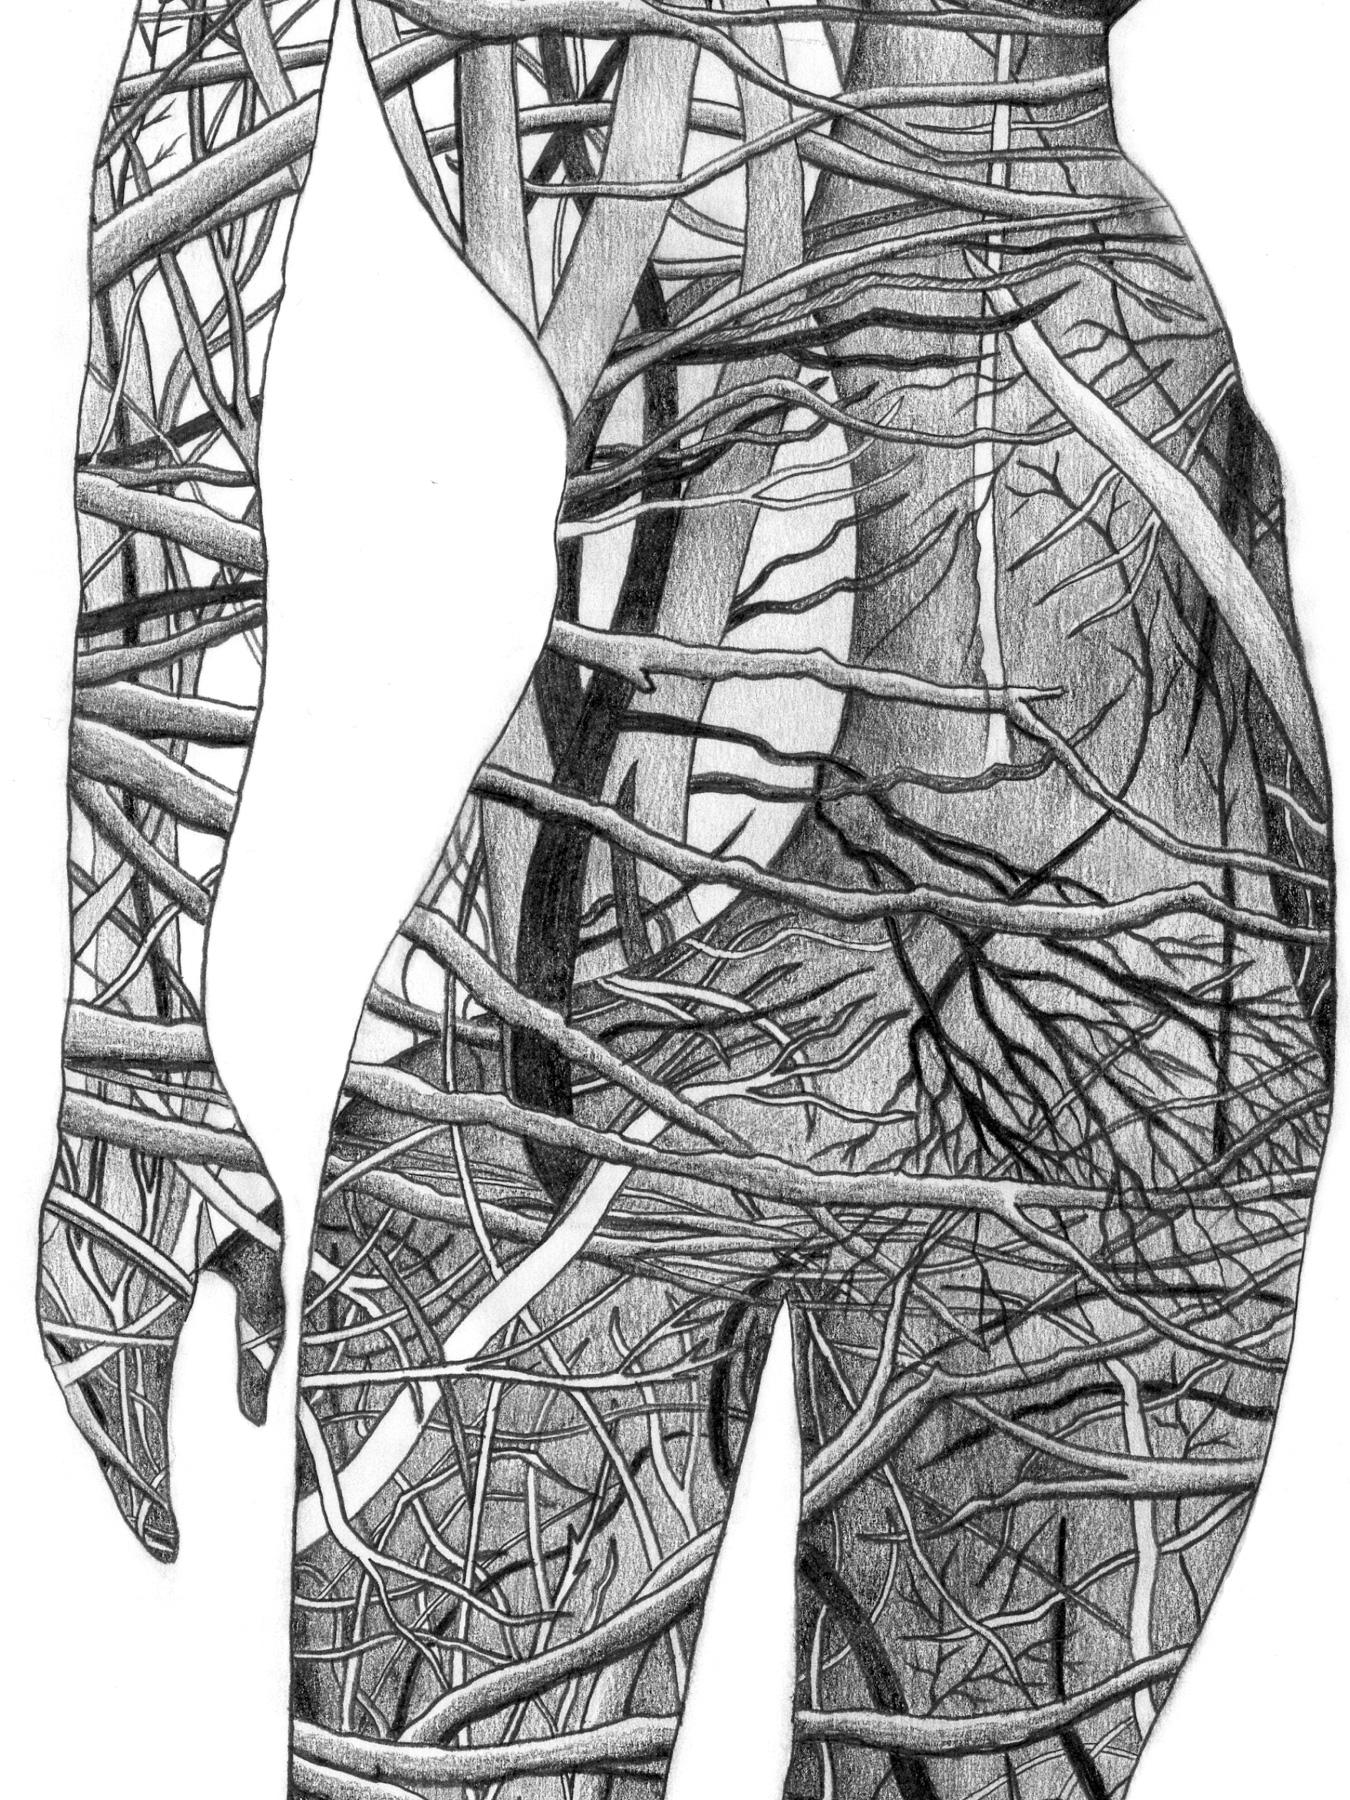 Human Nature 5 | A2 Giclée Print - detail